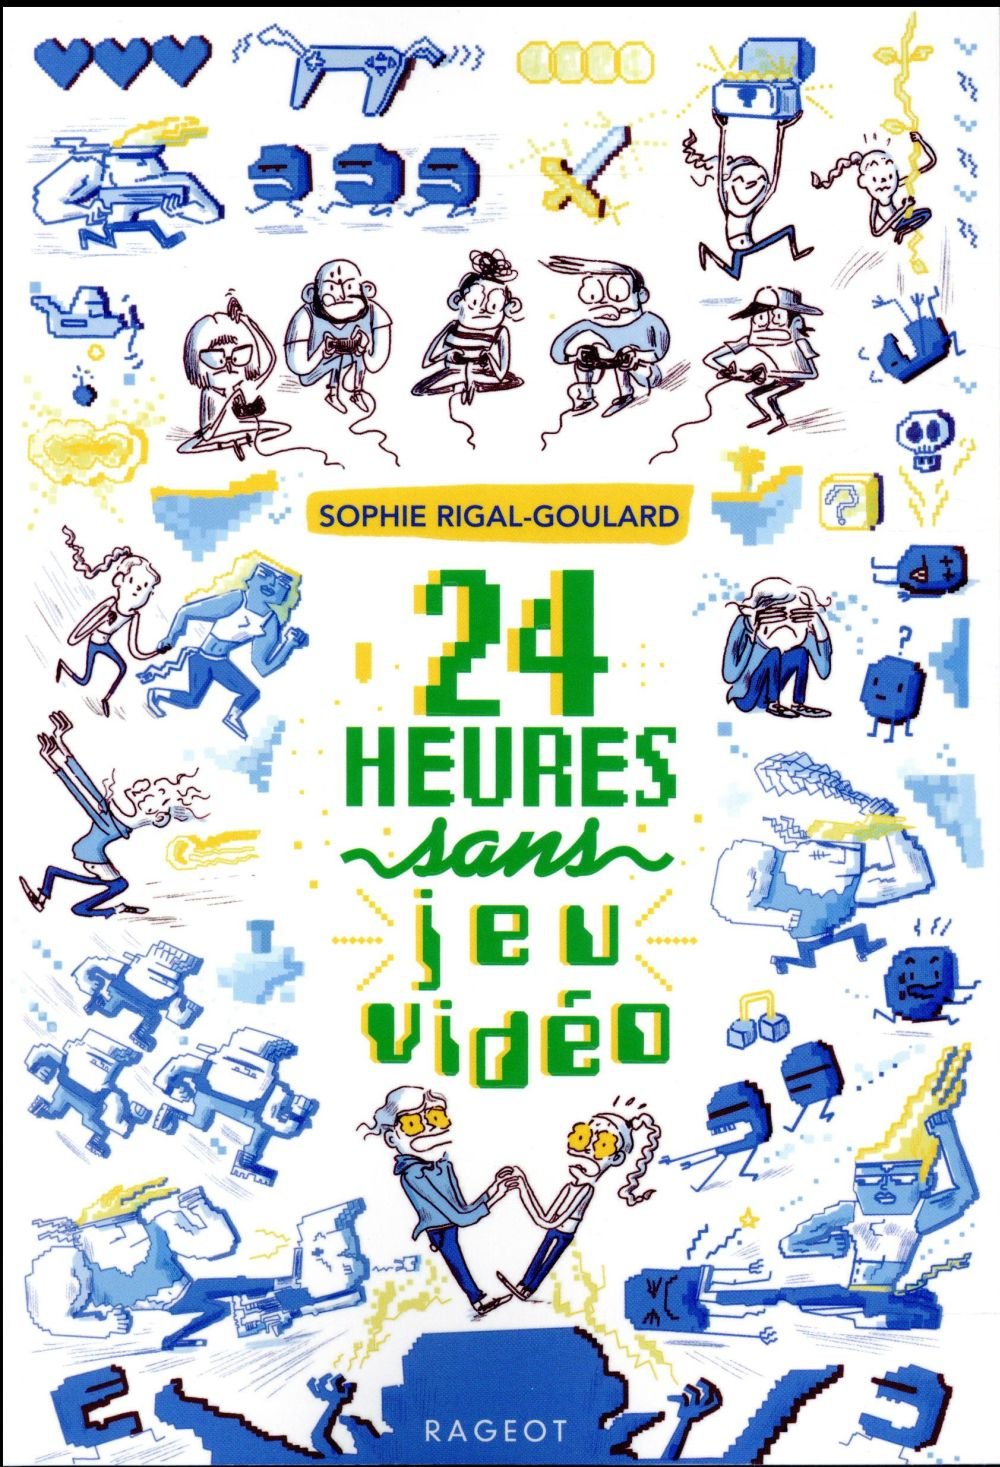 24 HEURES SANS JEU VIDEO RIGAL GOULARD SOPHIE RAGEOT